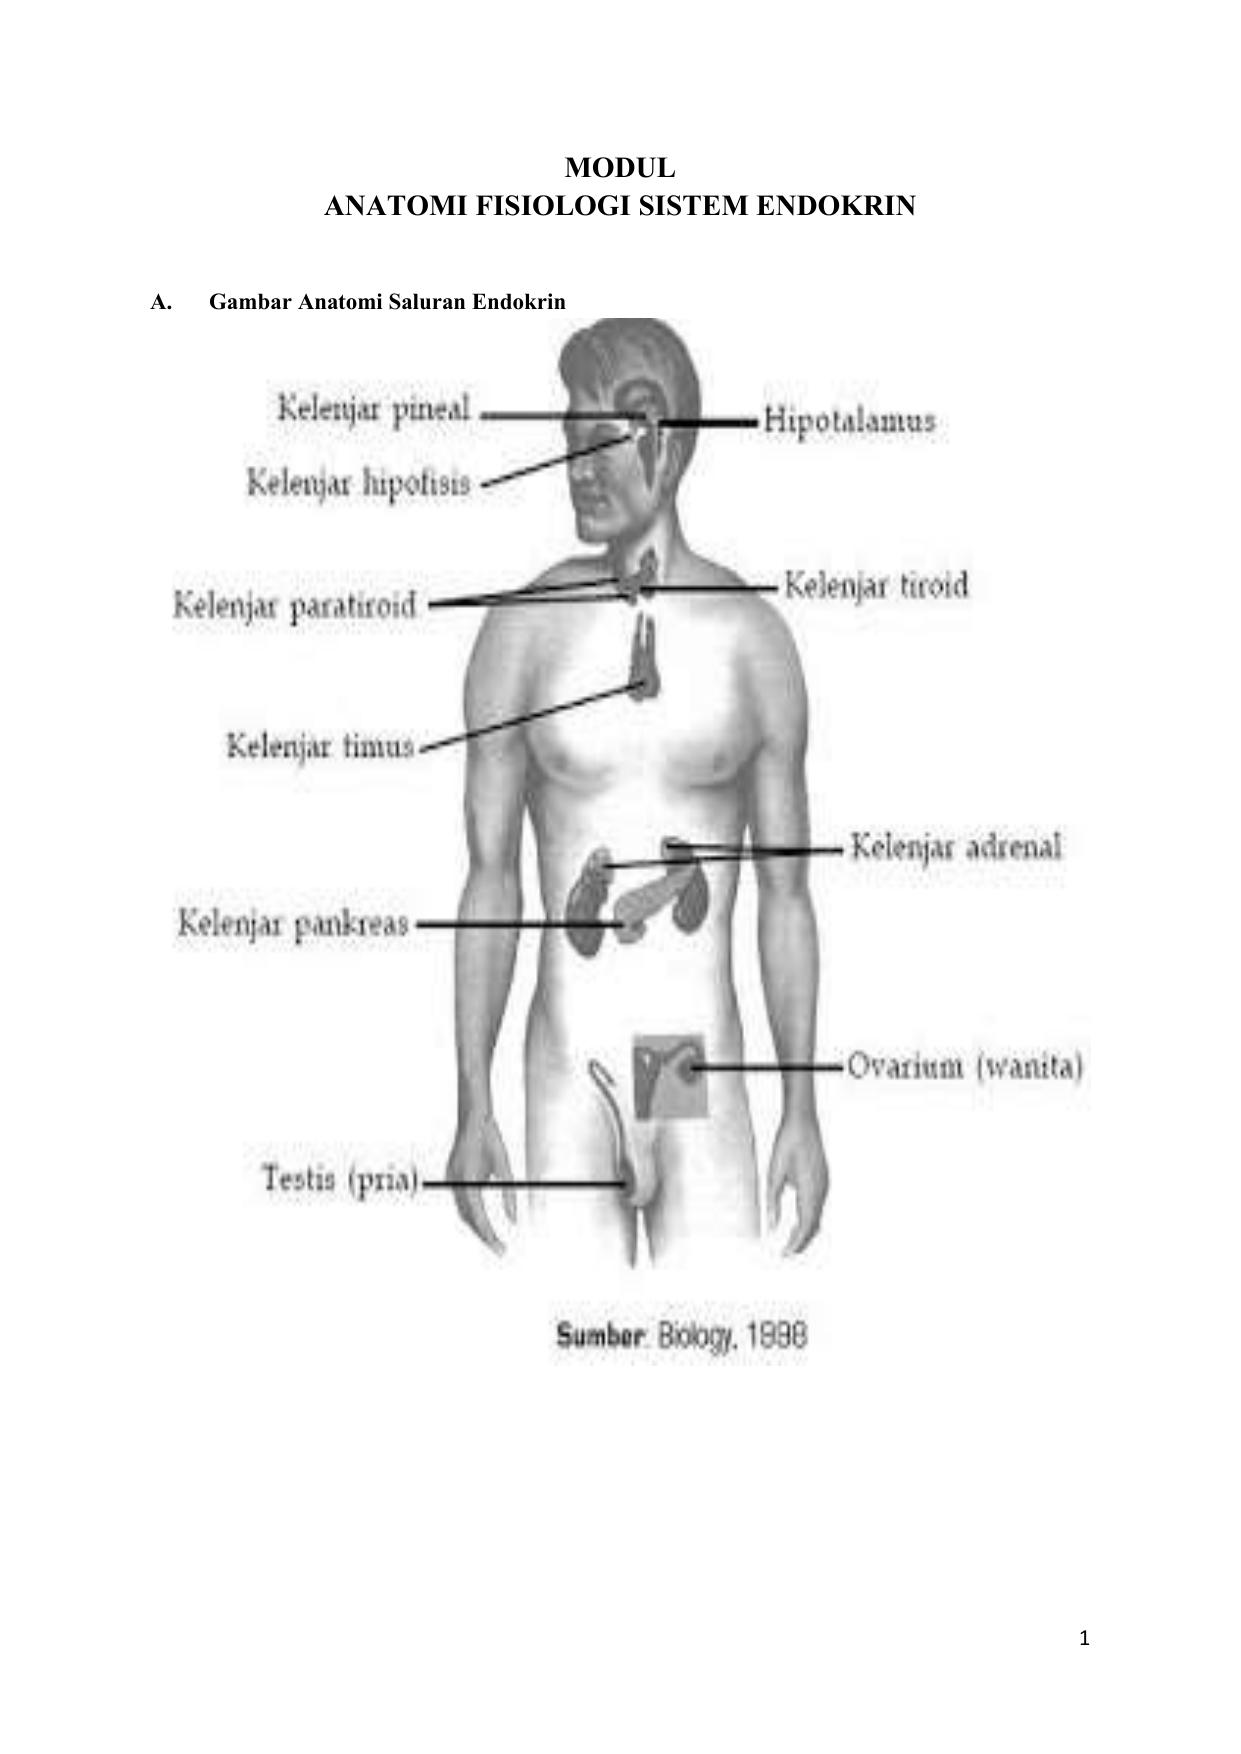 Modul Anatomi Fisiologi Sistem Endokrin